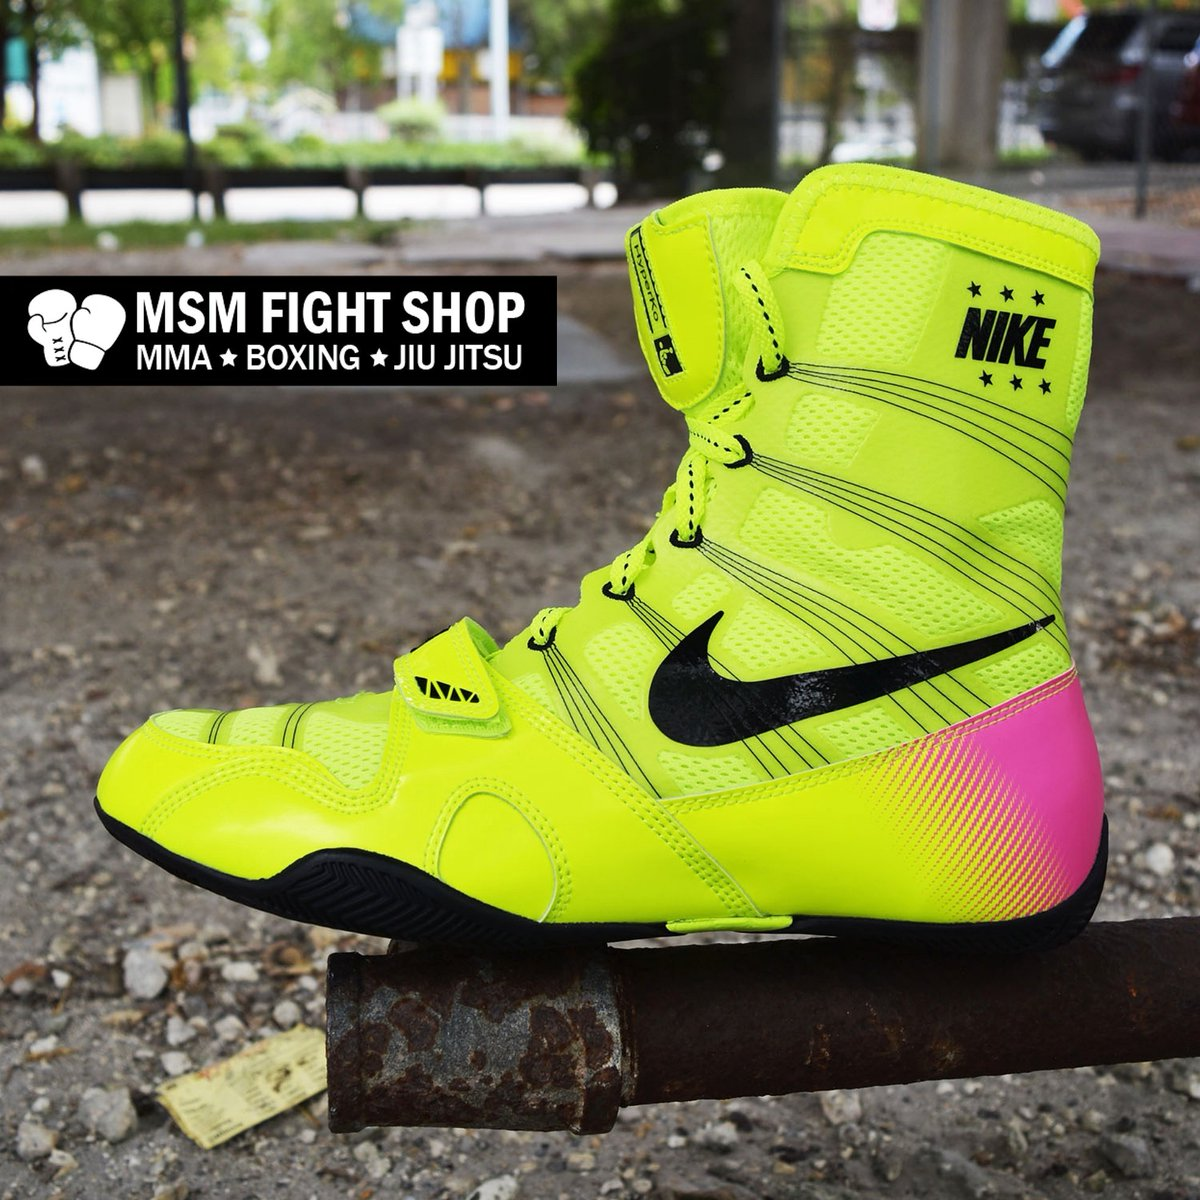 brand new 75924 73ffb MSM FIGHT SHOP on Twitter